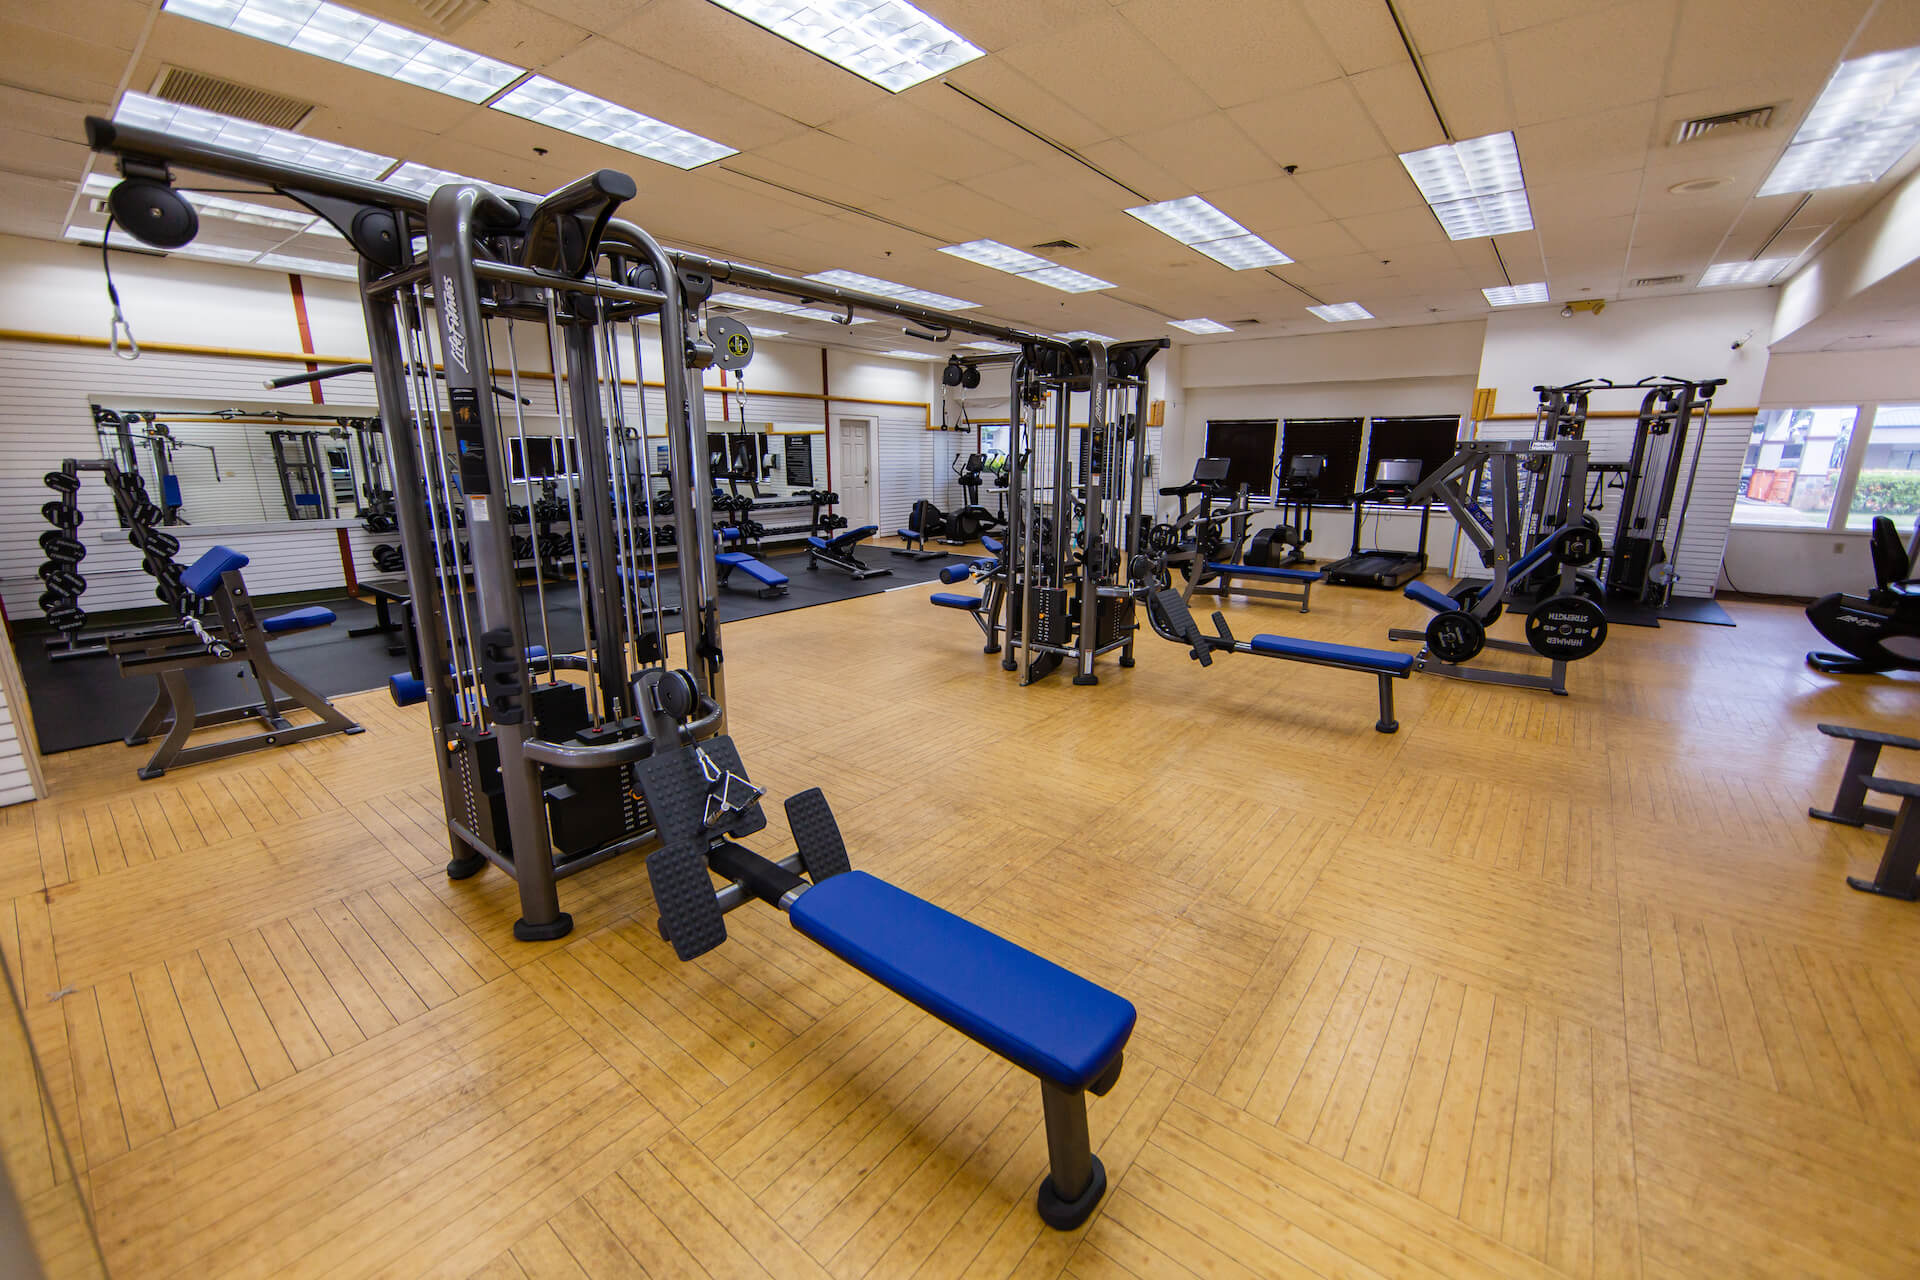 Club Maui Lahaina Cardio & Weight Room